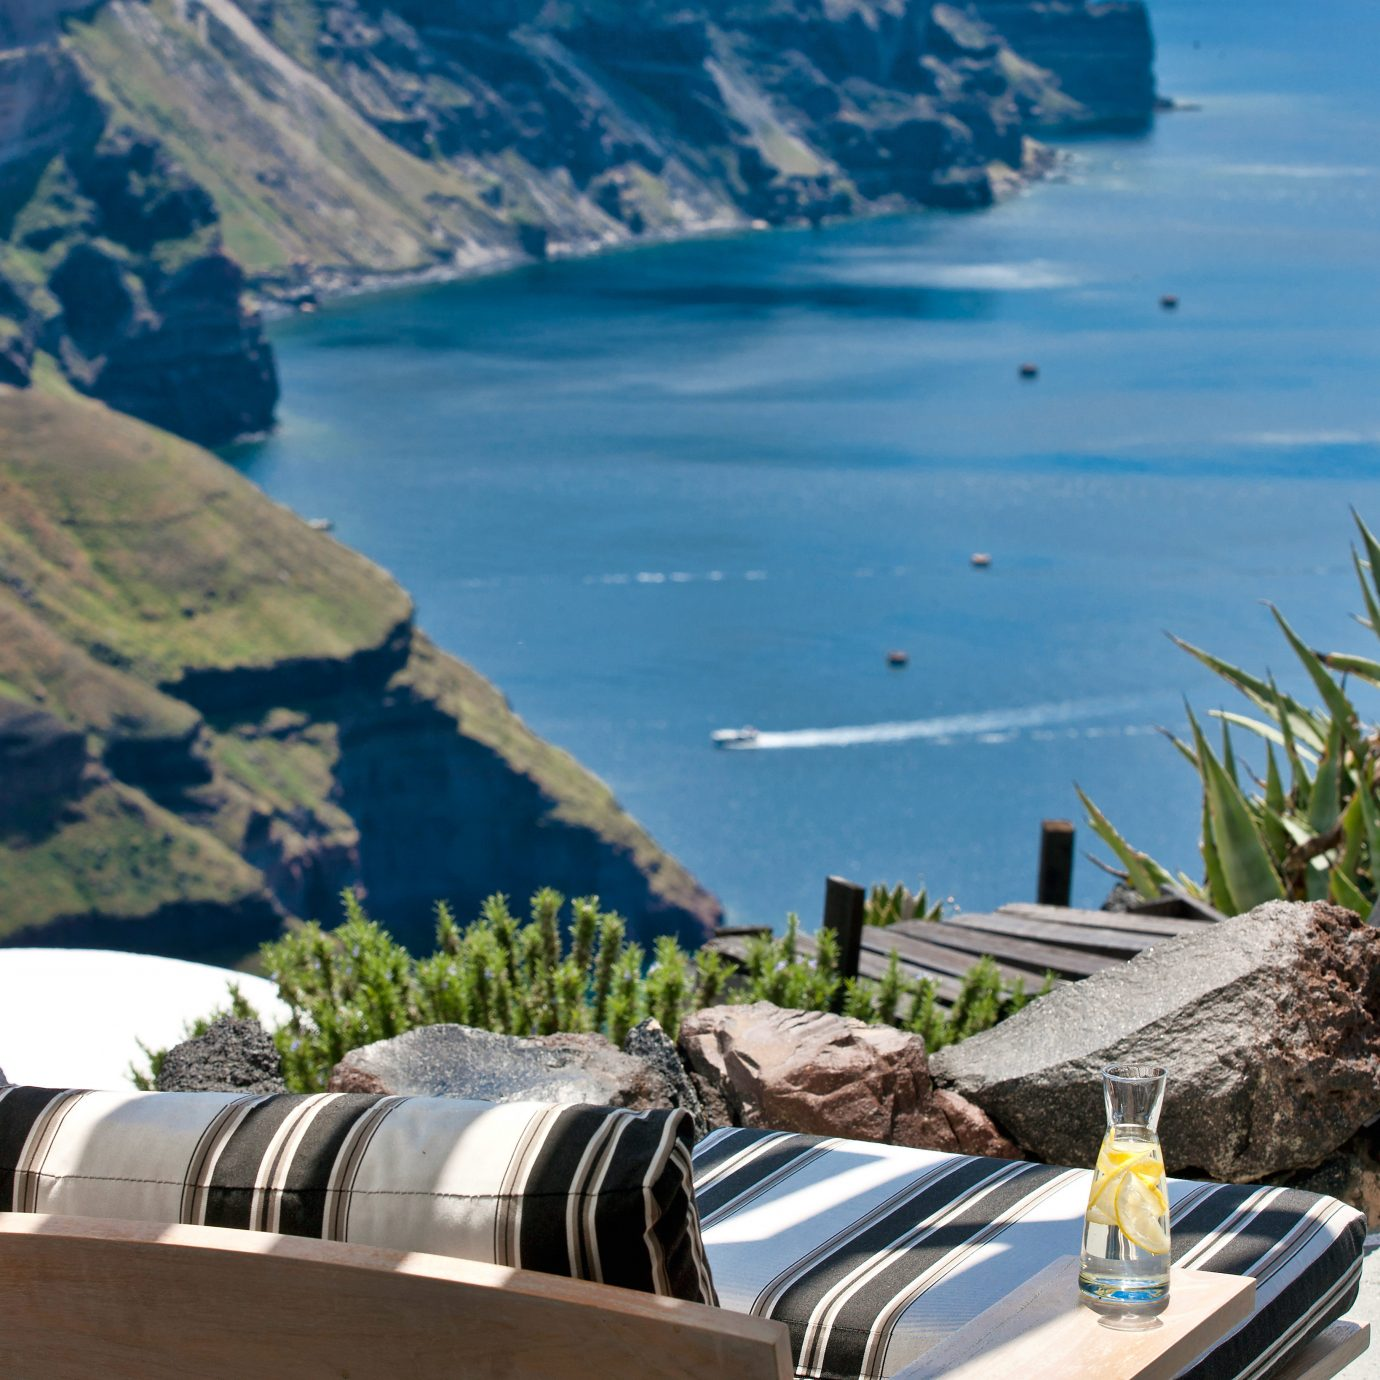 Bar Drink Eat Ocean Scenic views mountain Nature Coast Sea Lake vehicle overlooking